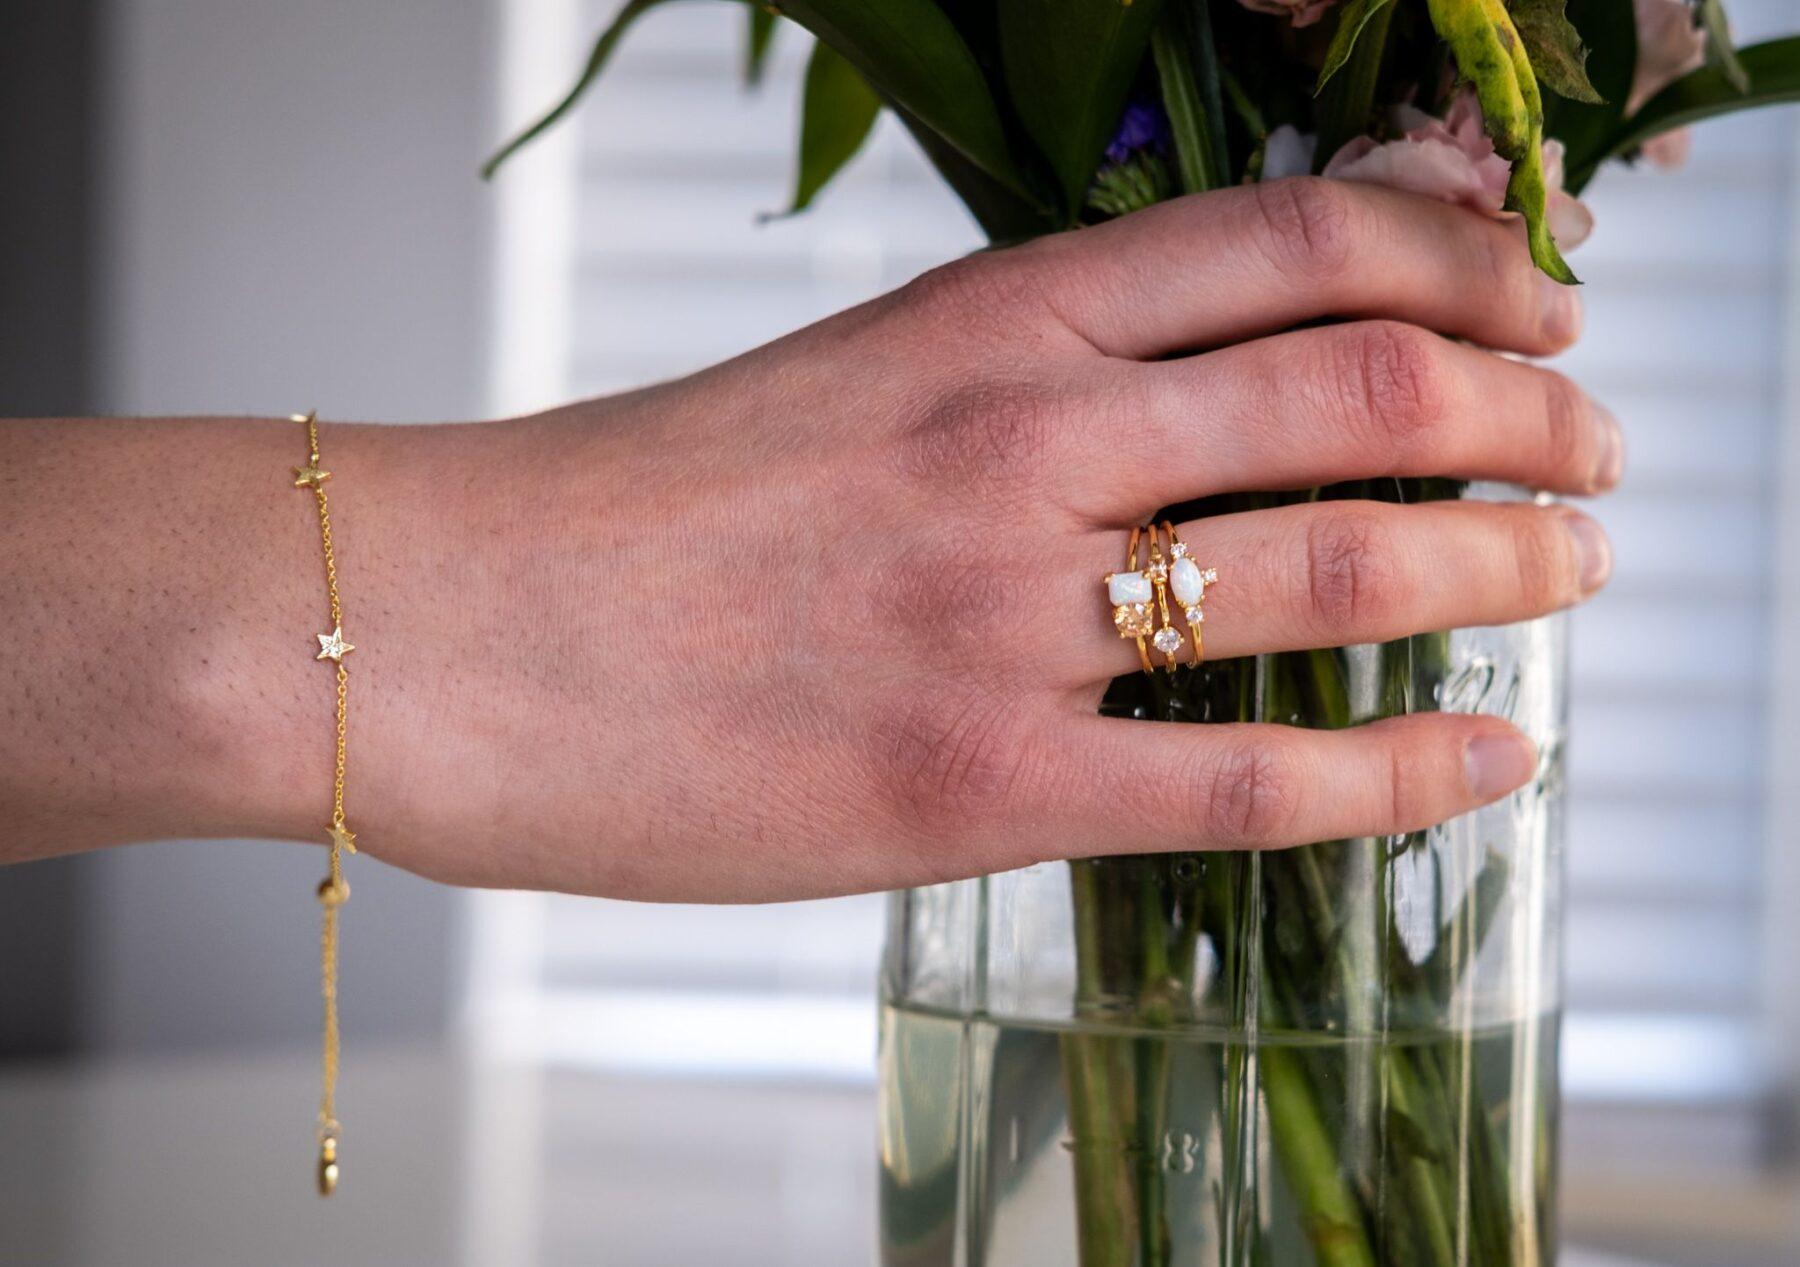 gorjana bracelet and ring set for vendor appointments